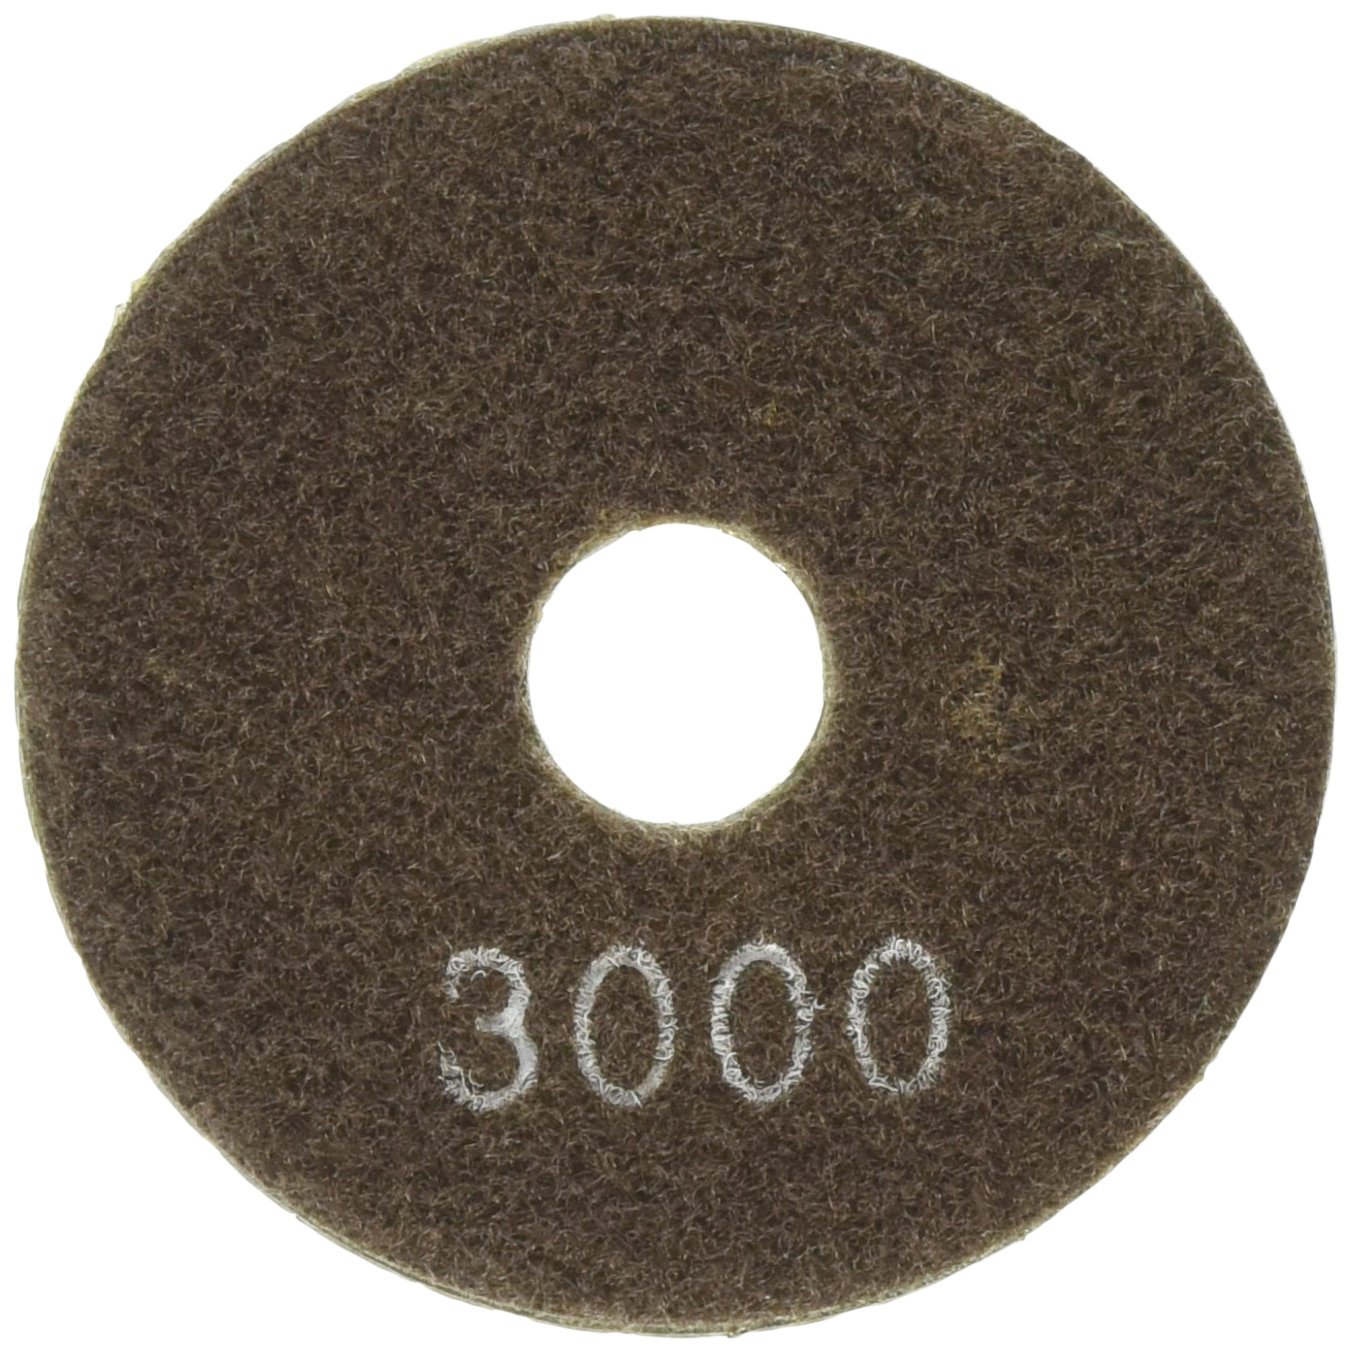 MK Diamond 157114 3000 Grit Premium Resin Wet Polishing Disc 3 3 Builders World Wholesale Distribution